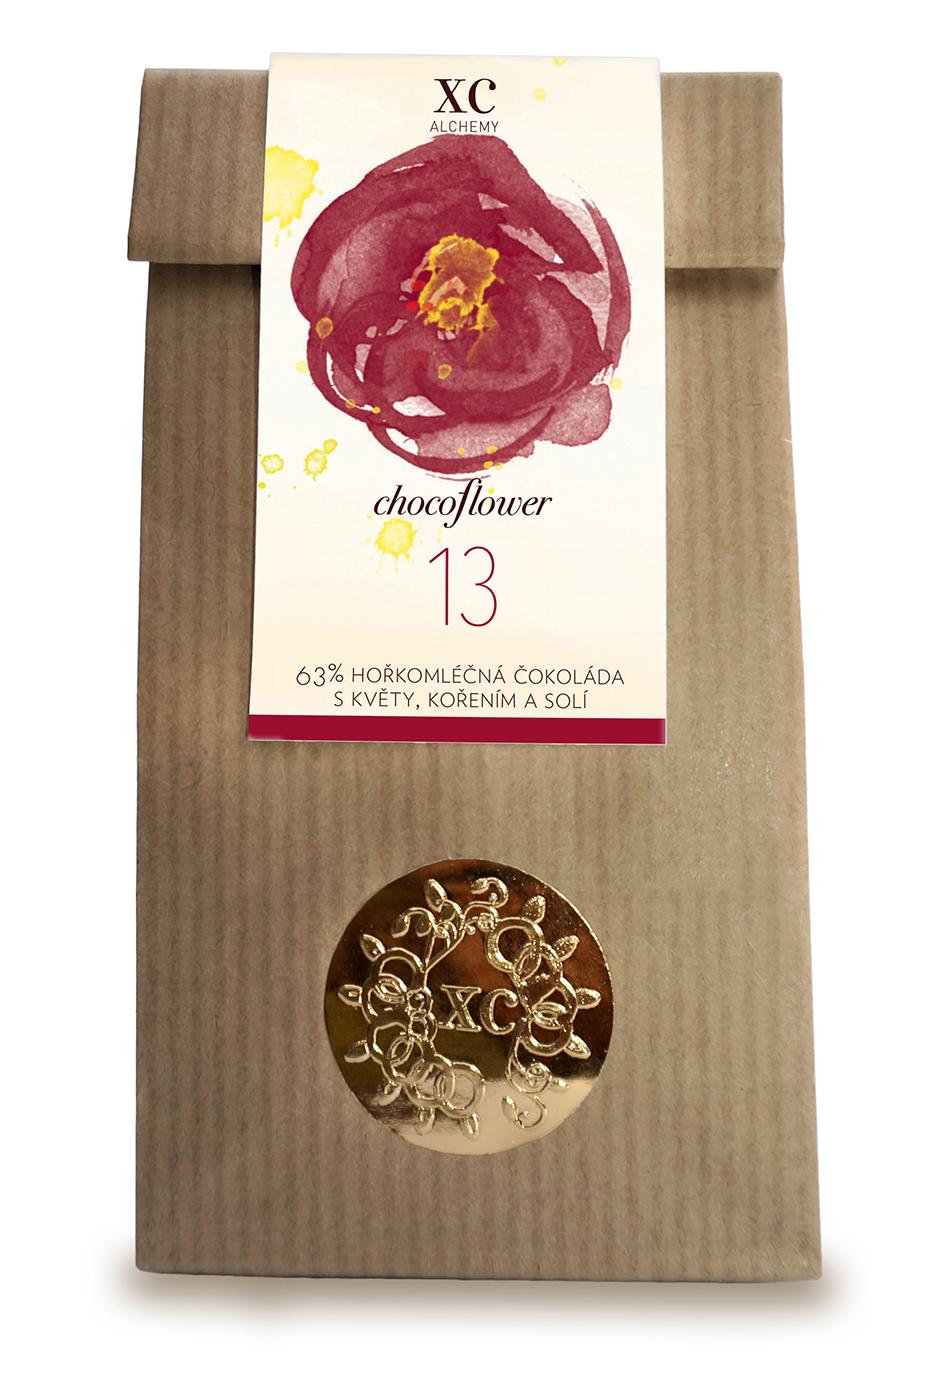 xc chocoflower 13 opomlk L